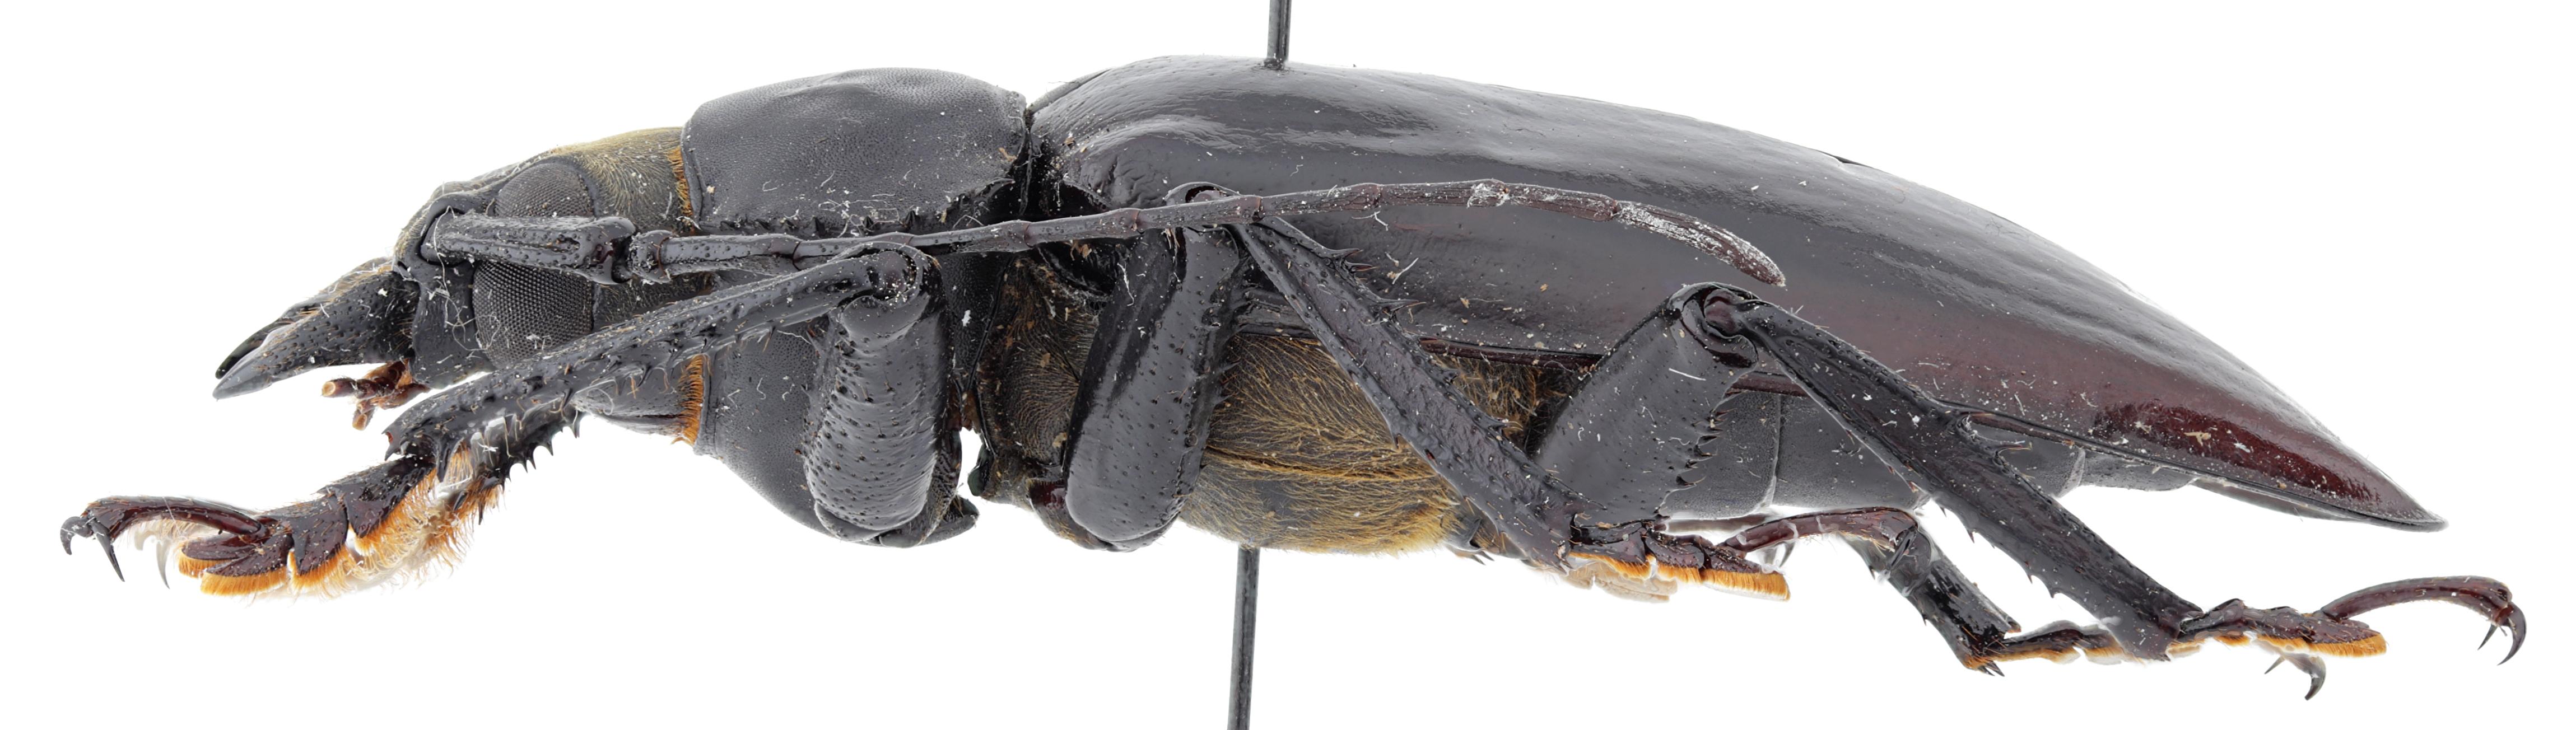 Rhaphipodus celebensis ht M L.jpg